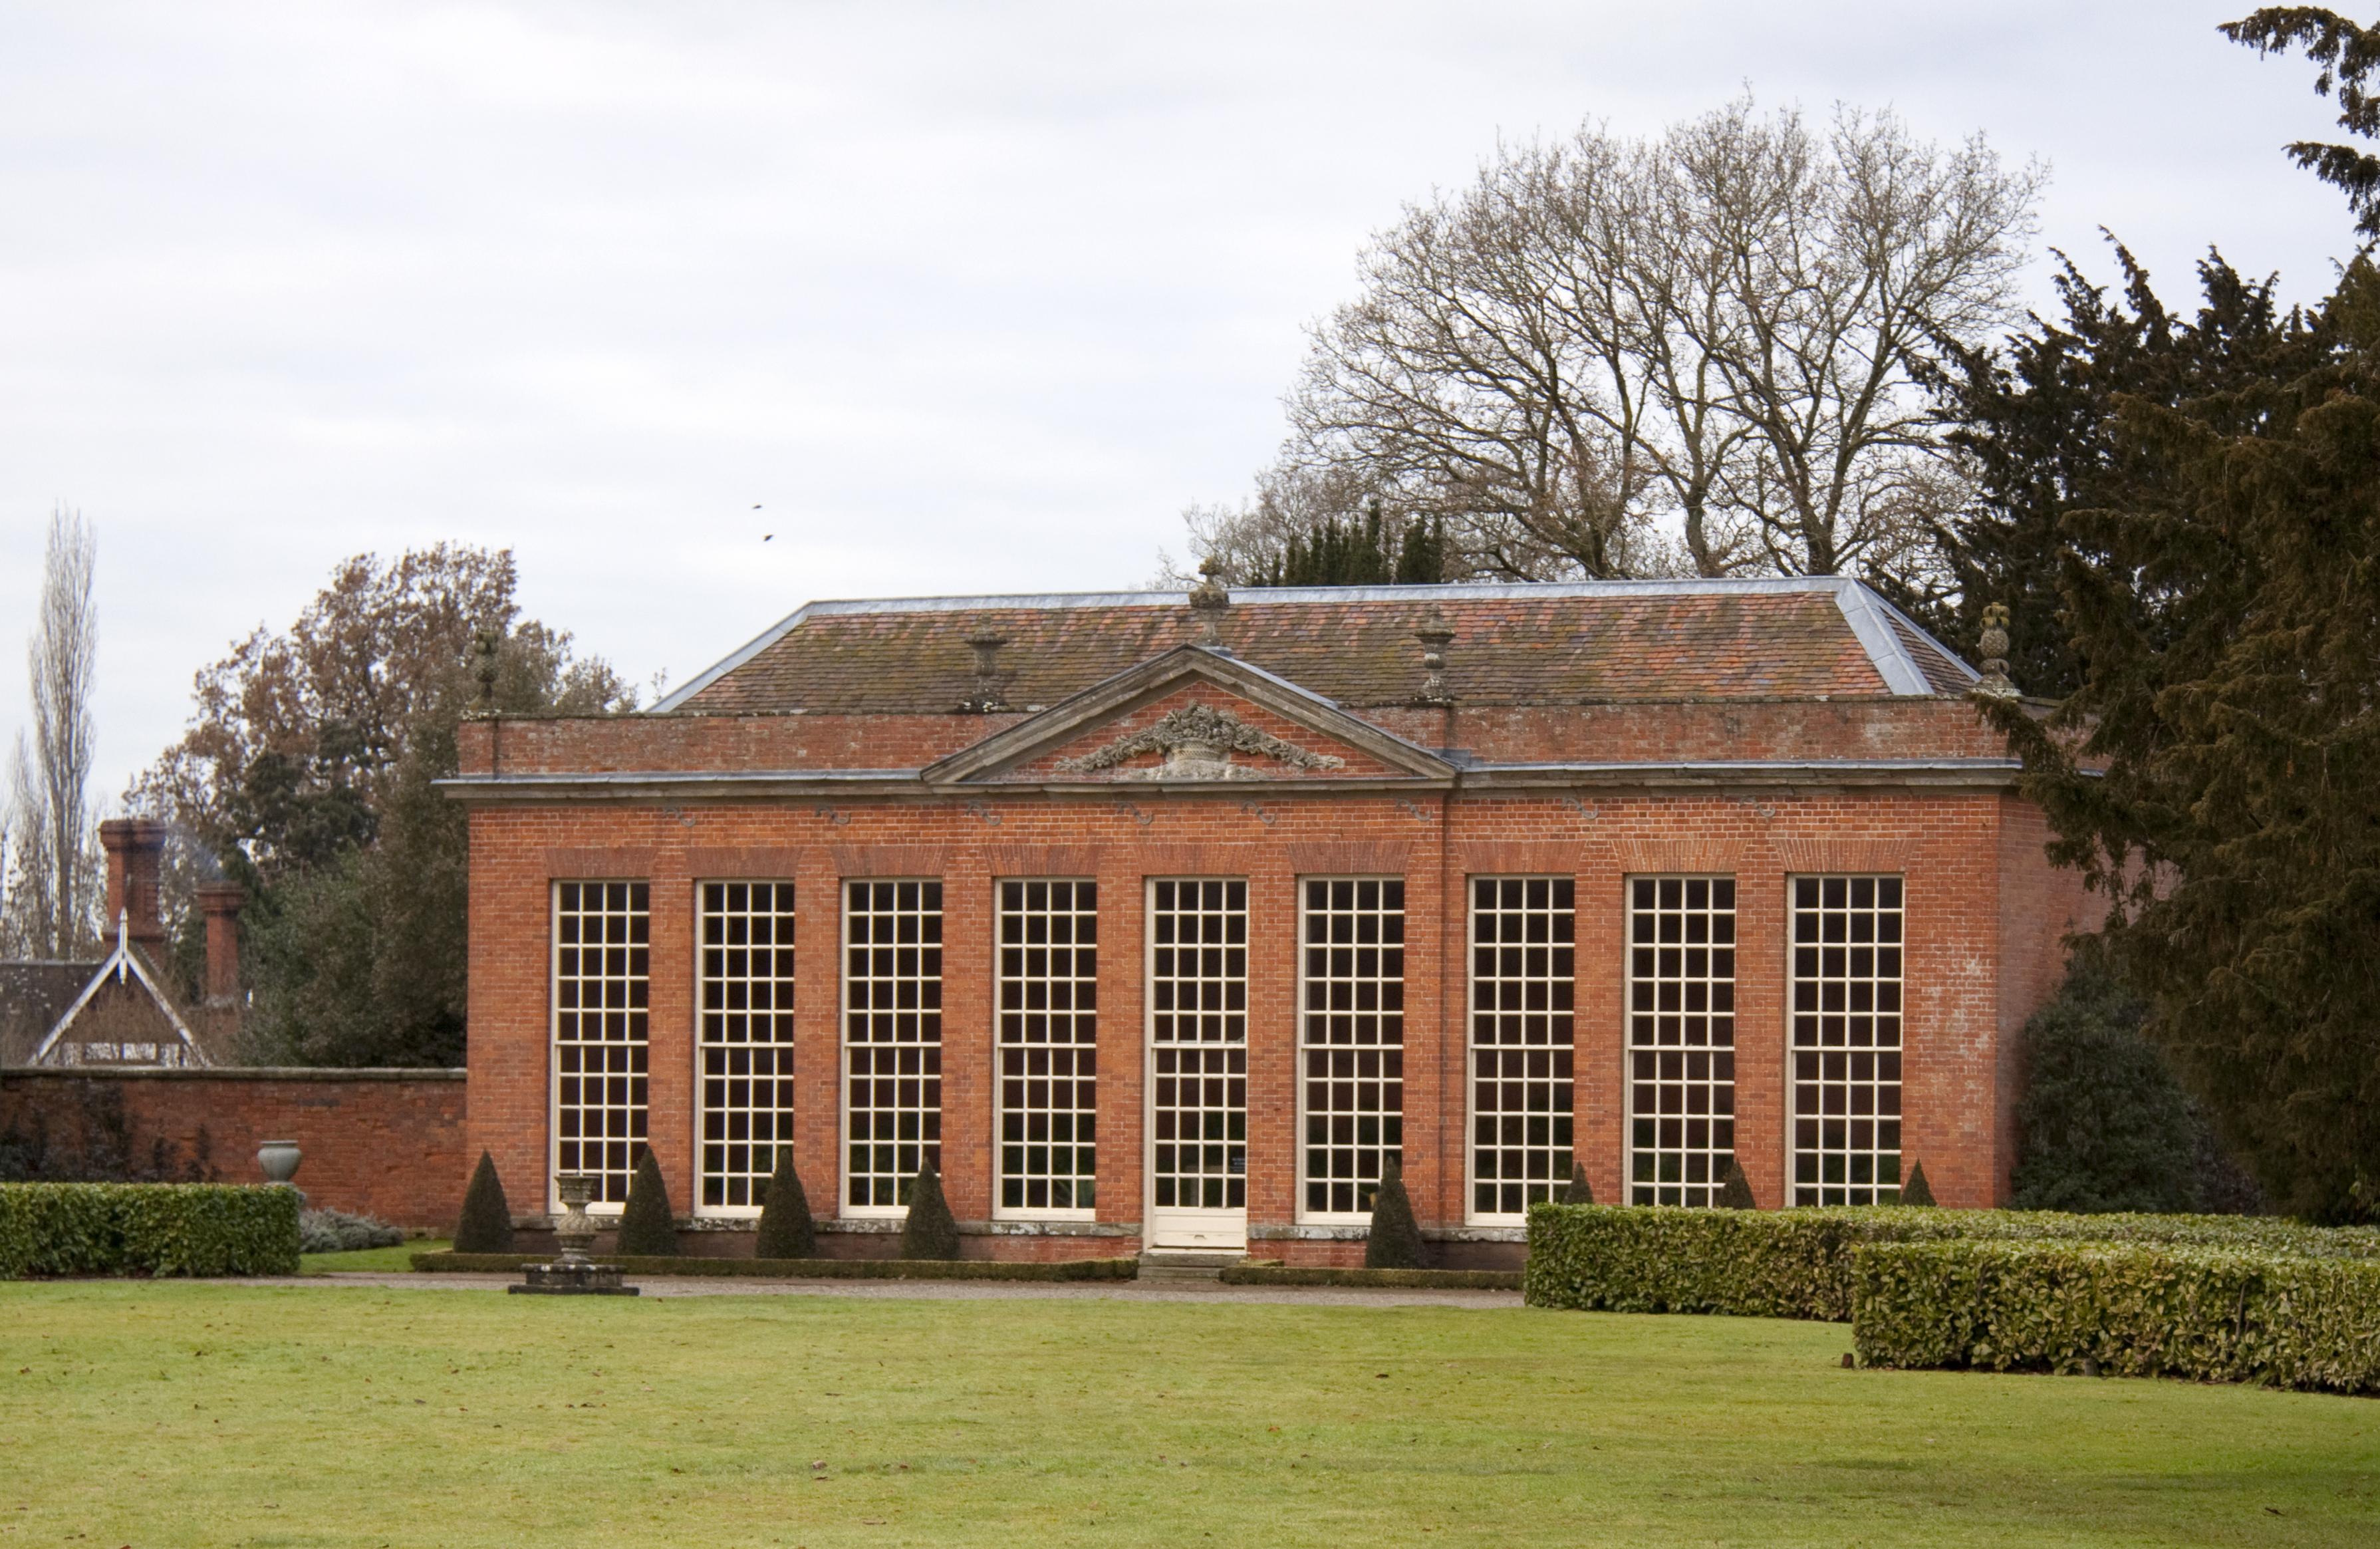 Hanbury Hall Orangery File:hanbury Hall Orangery